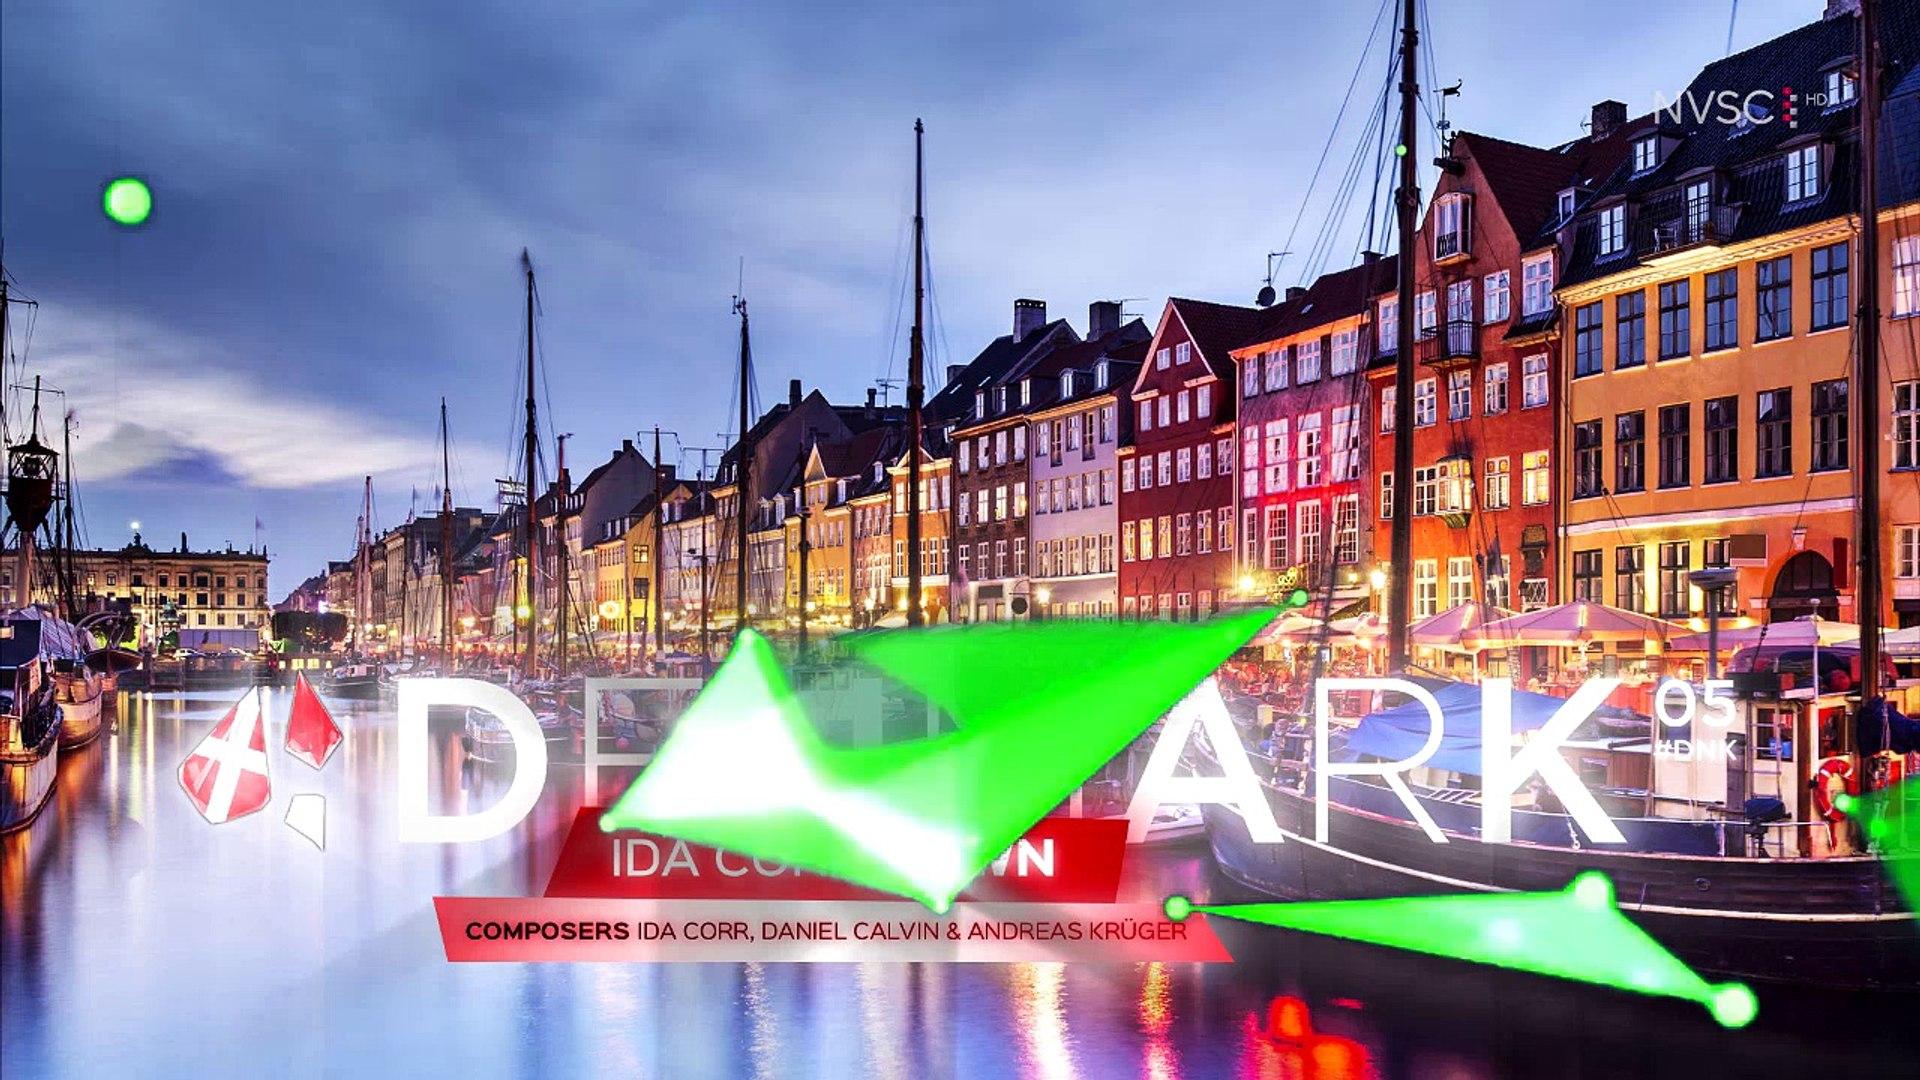 Ida Corr - Down (Denmark) (NVSC #19 Semi-final 2)